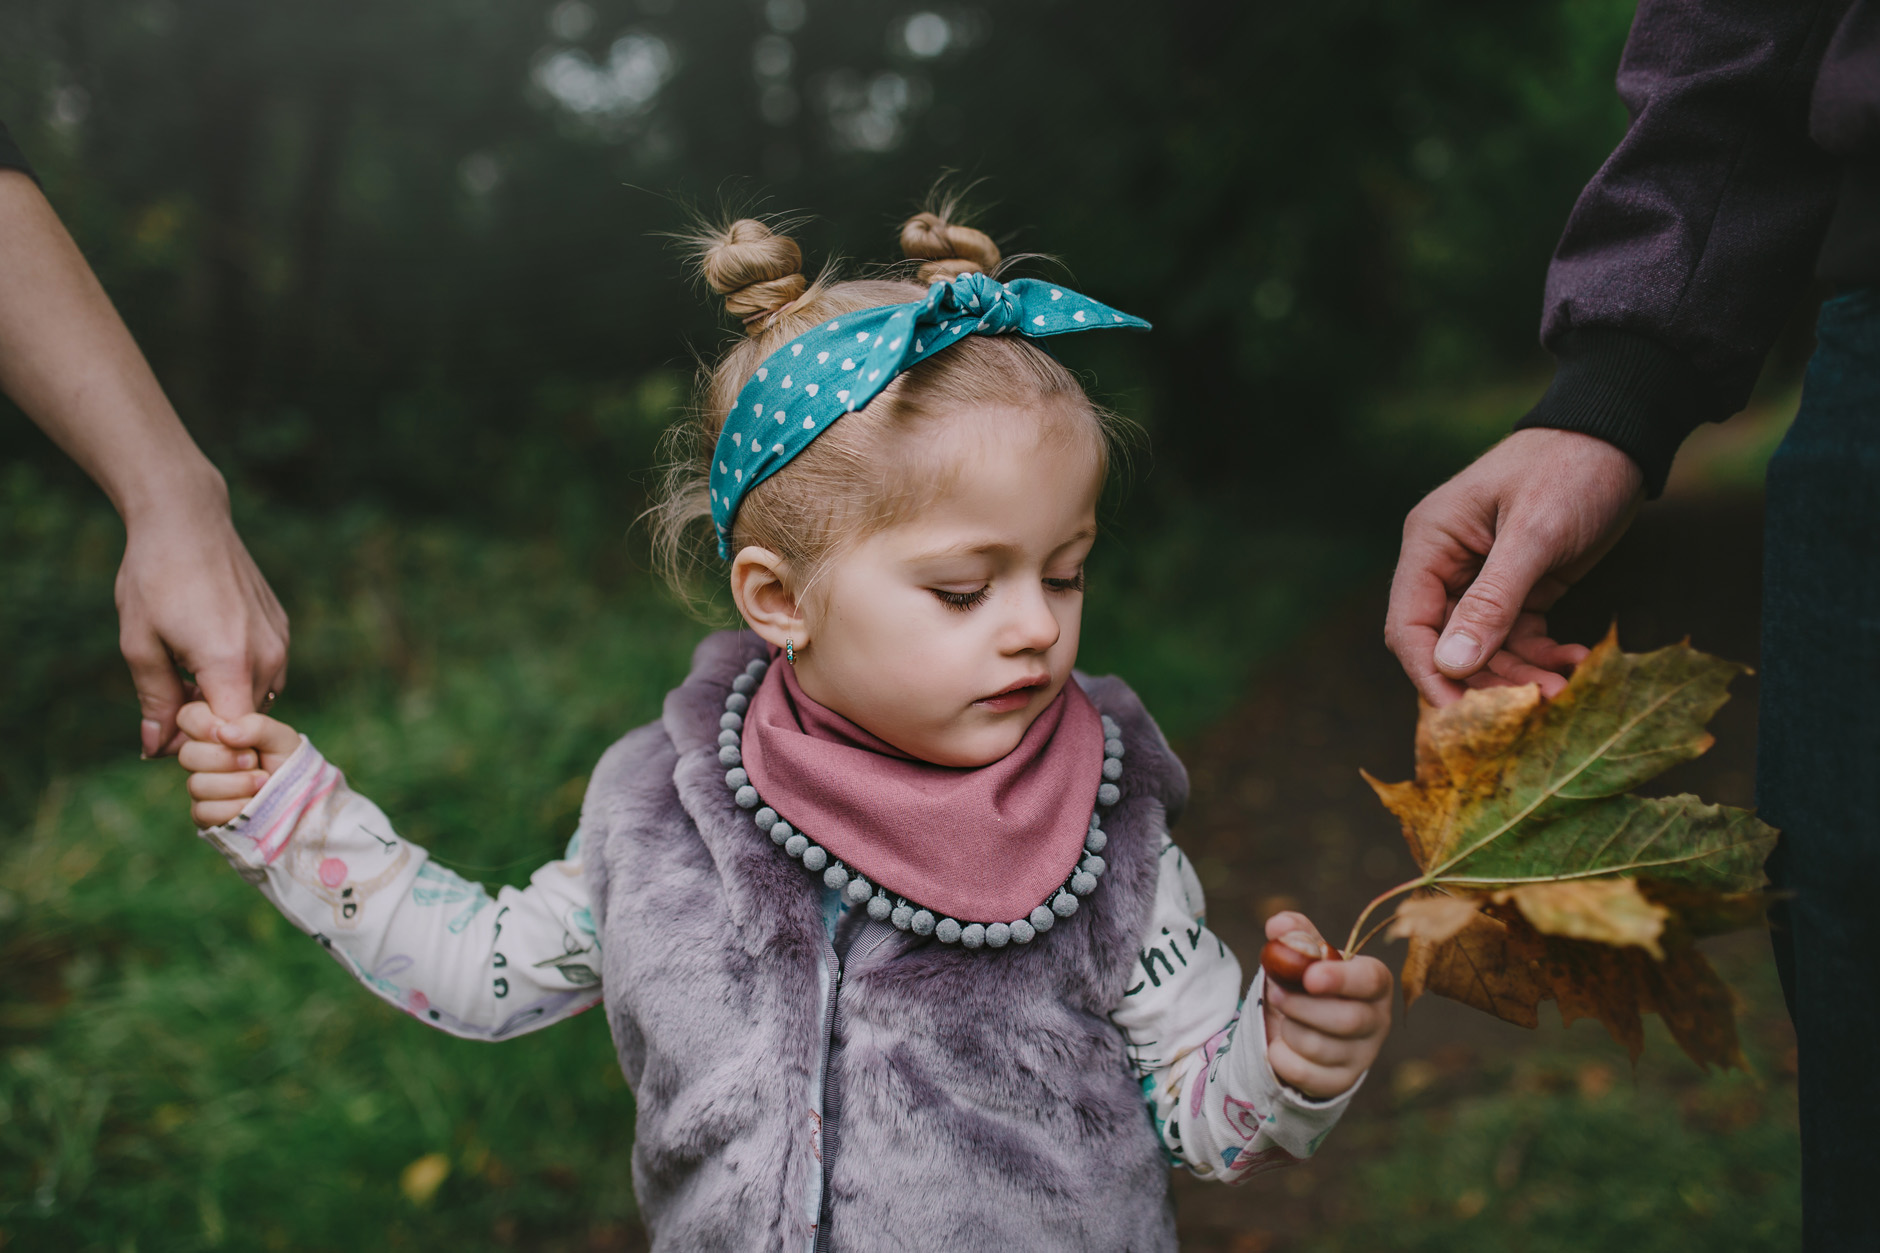 candid-natural-children-family-photographer-dublin-0143.jpg